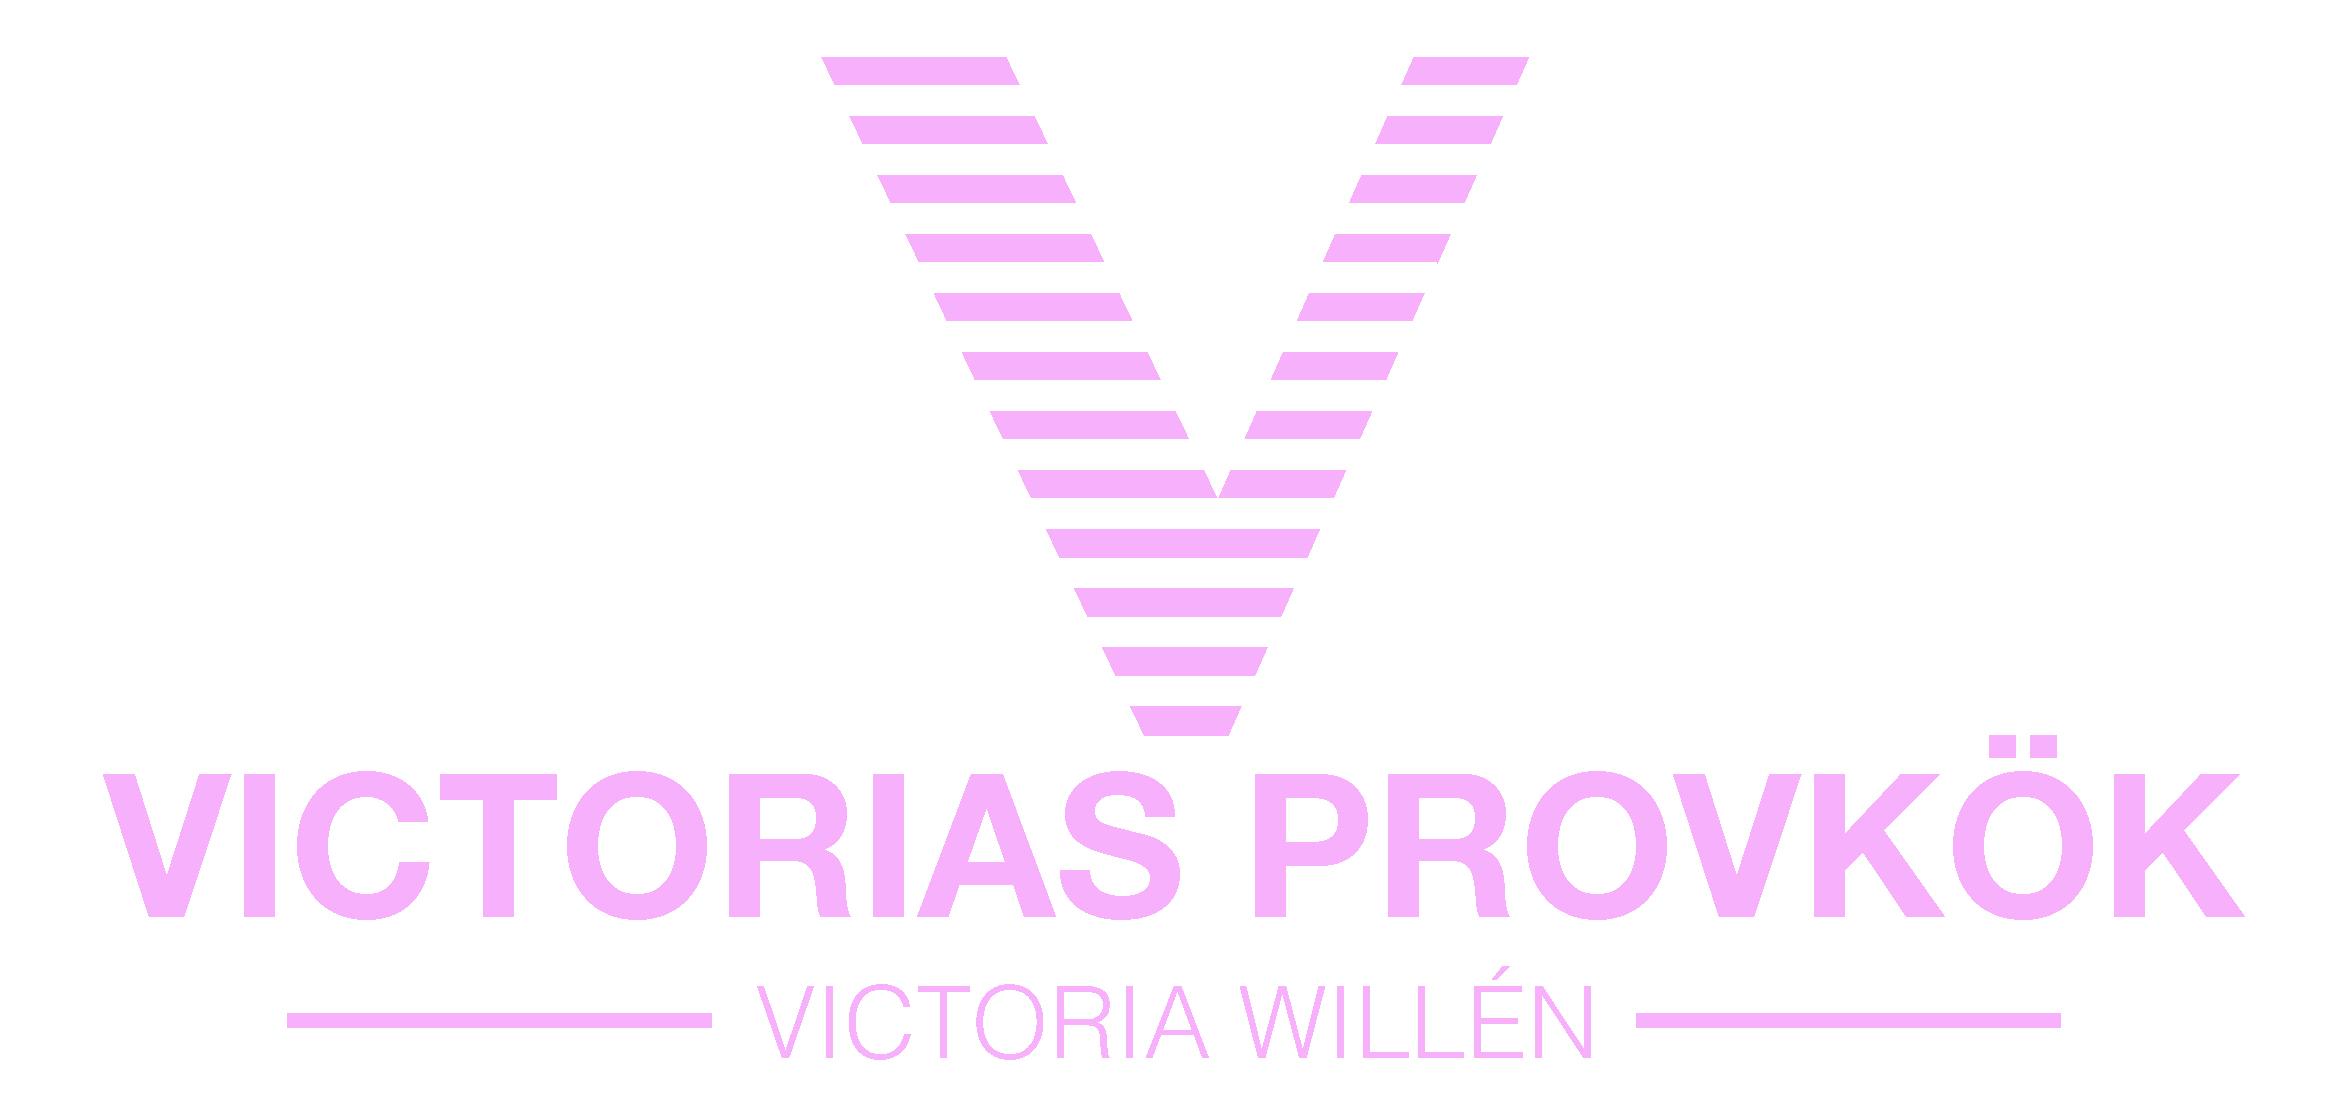 Victorias provkök